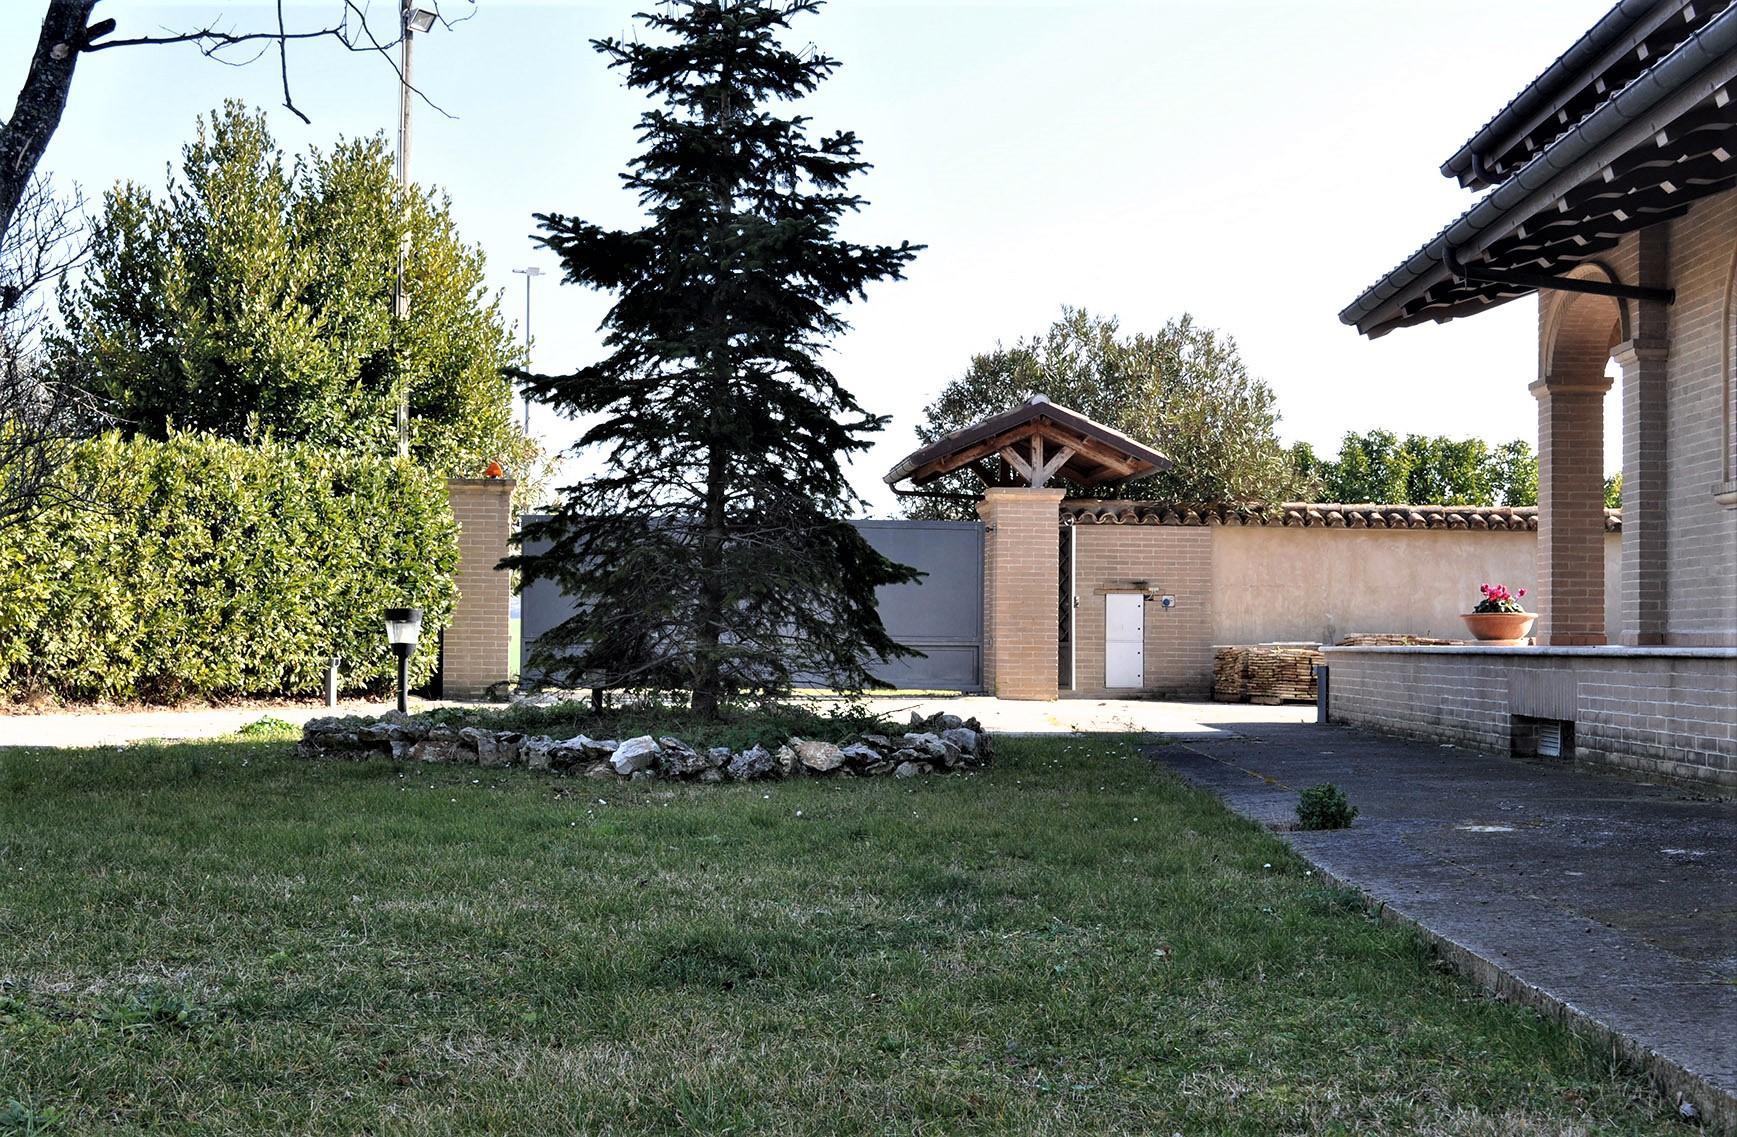 Villa Villa for sale Tortoreto (TE), Villa Bianca - Tortoreto - EUR 770.233 440